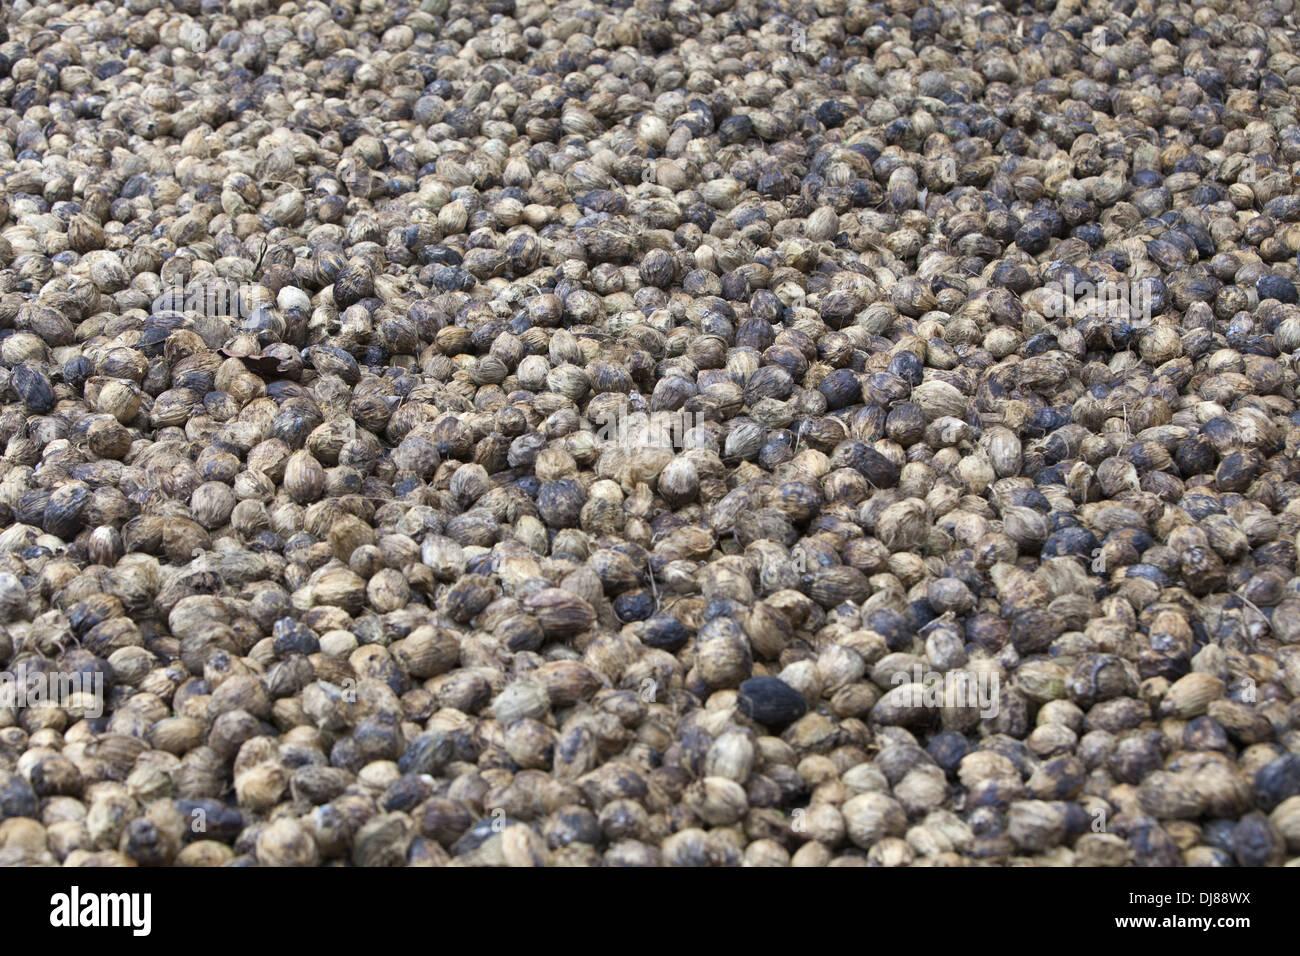 Betel Nut or Supari, Andaman Islands, India - Stock Image